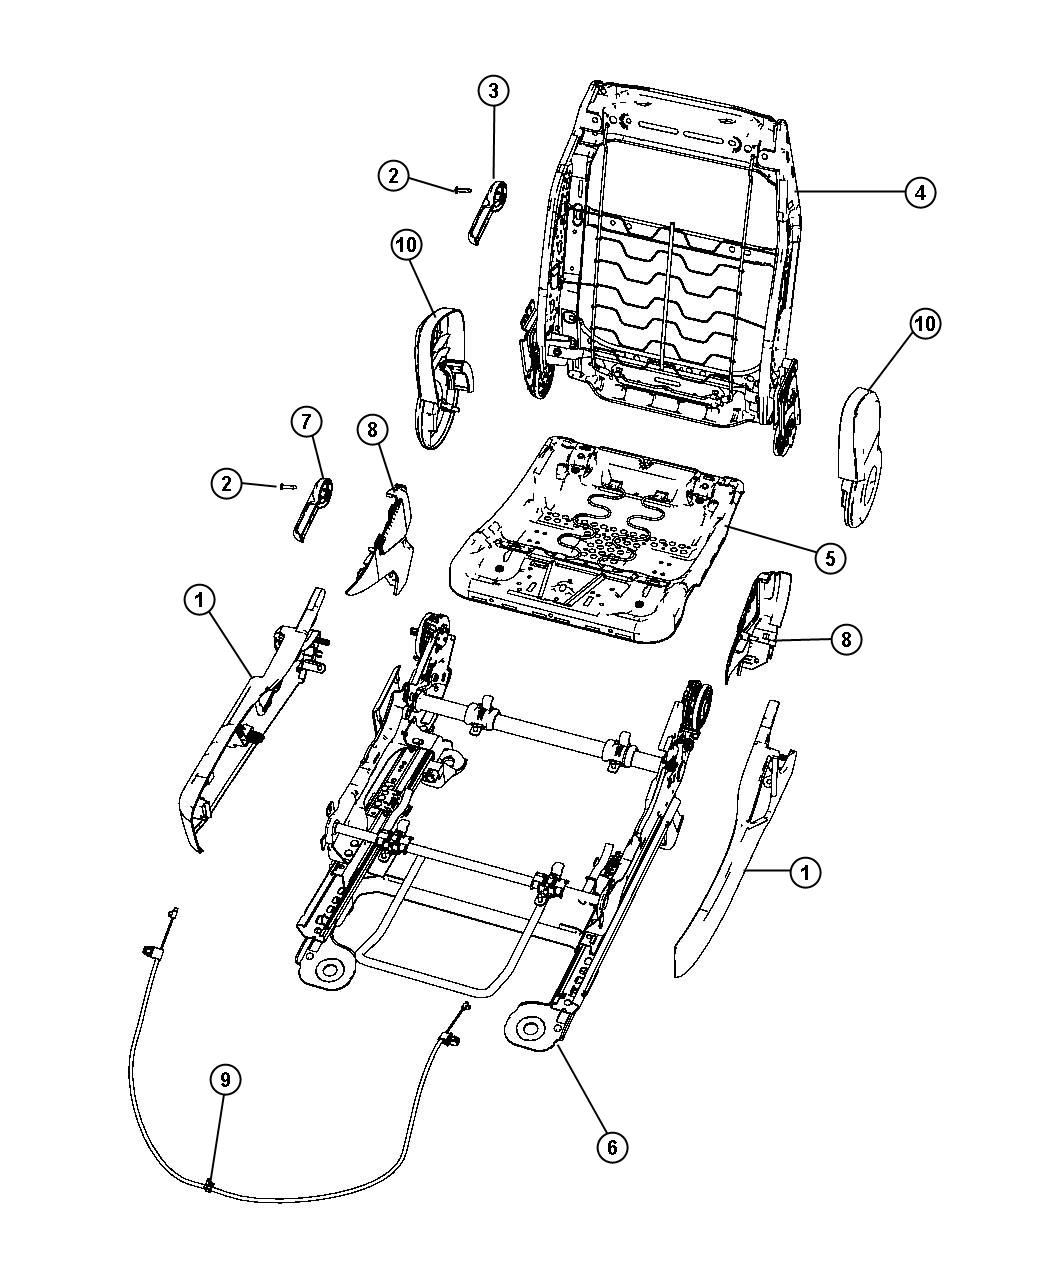 2008 Dodge Avenger Shield. Seat cushion. Outboard. Trim